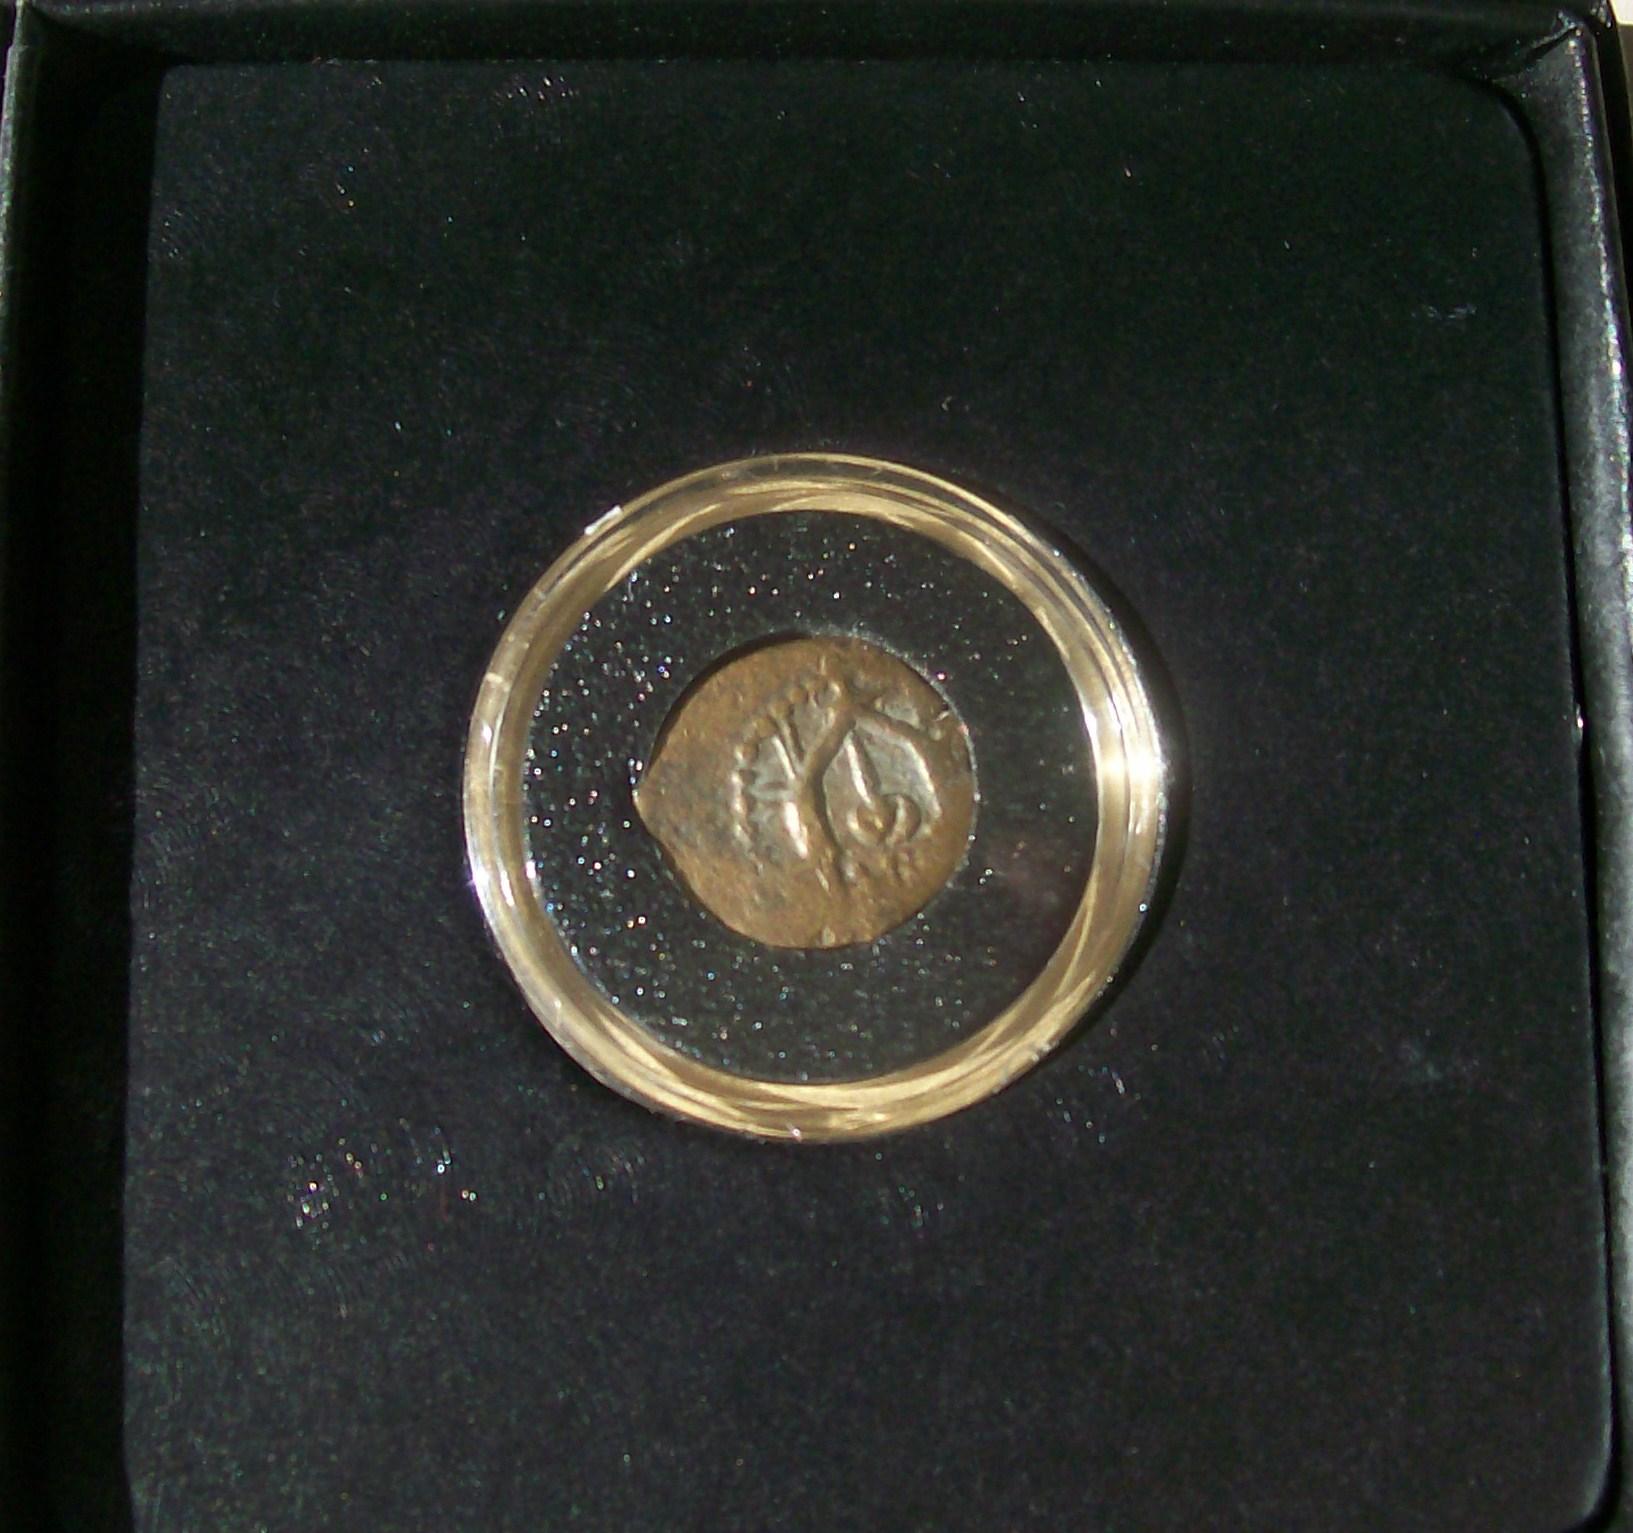 treasure in coins